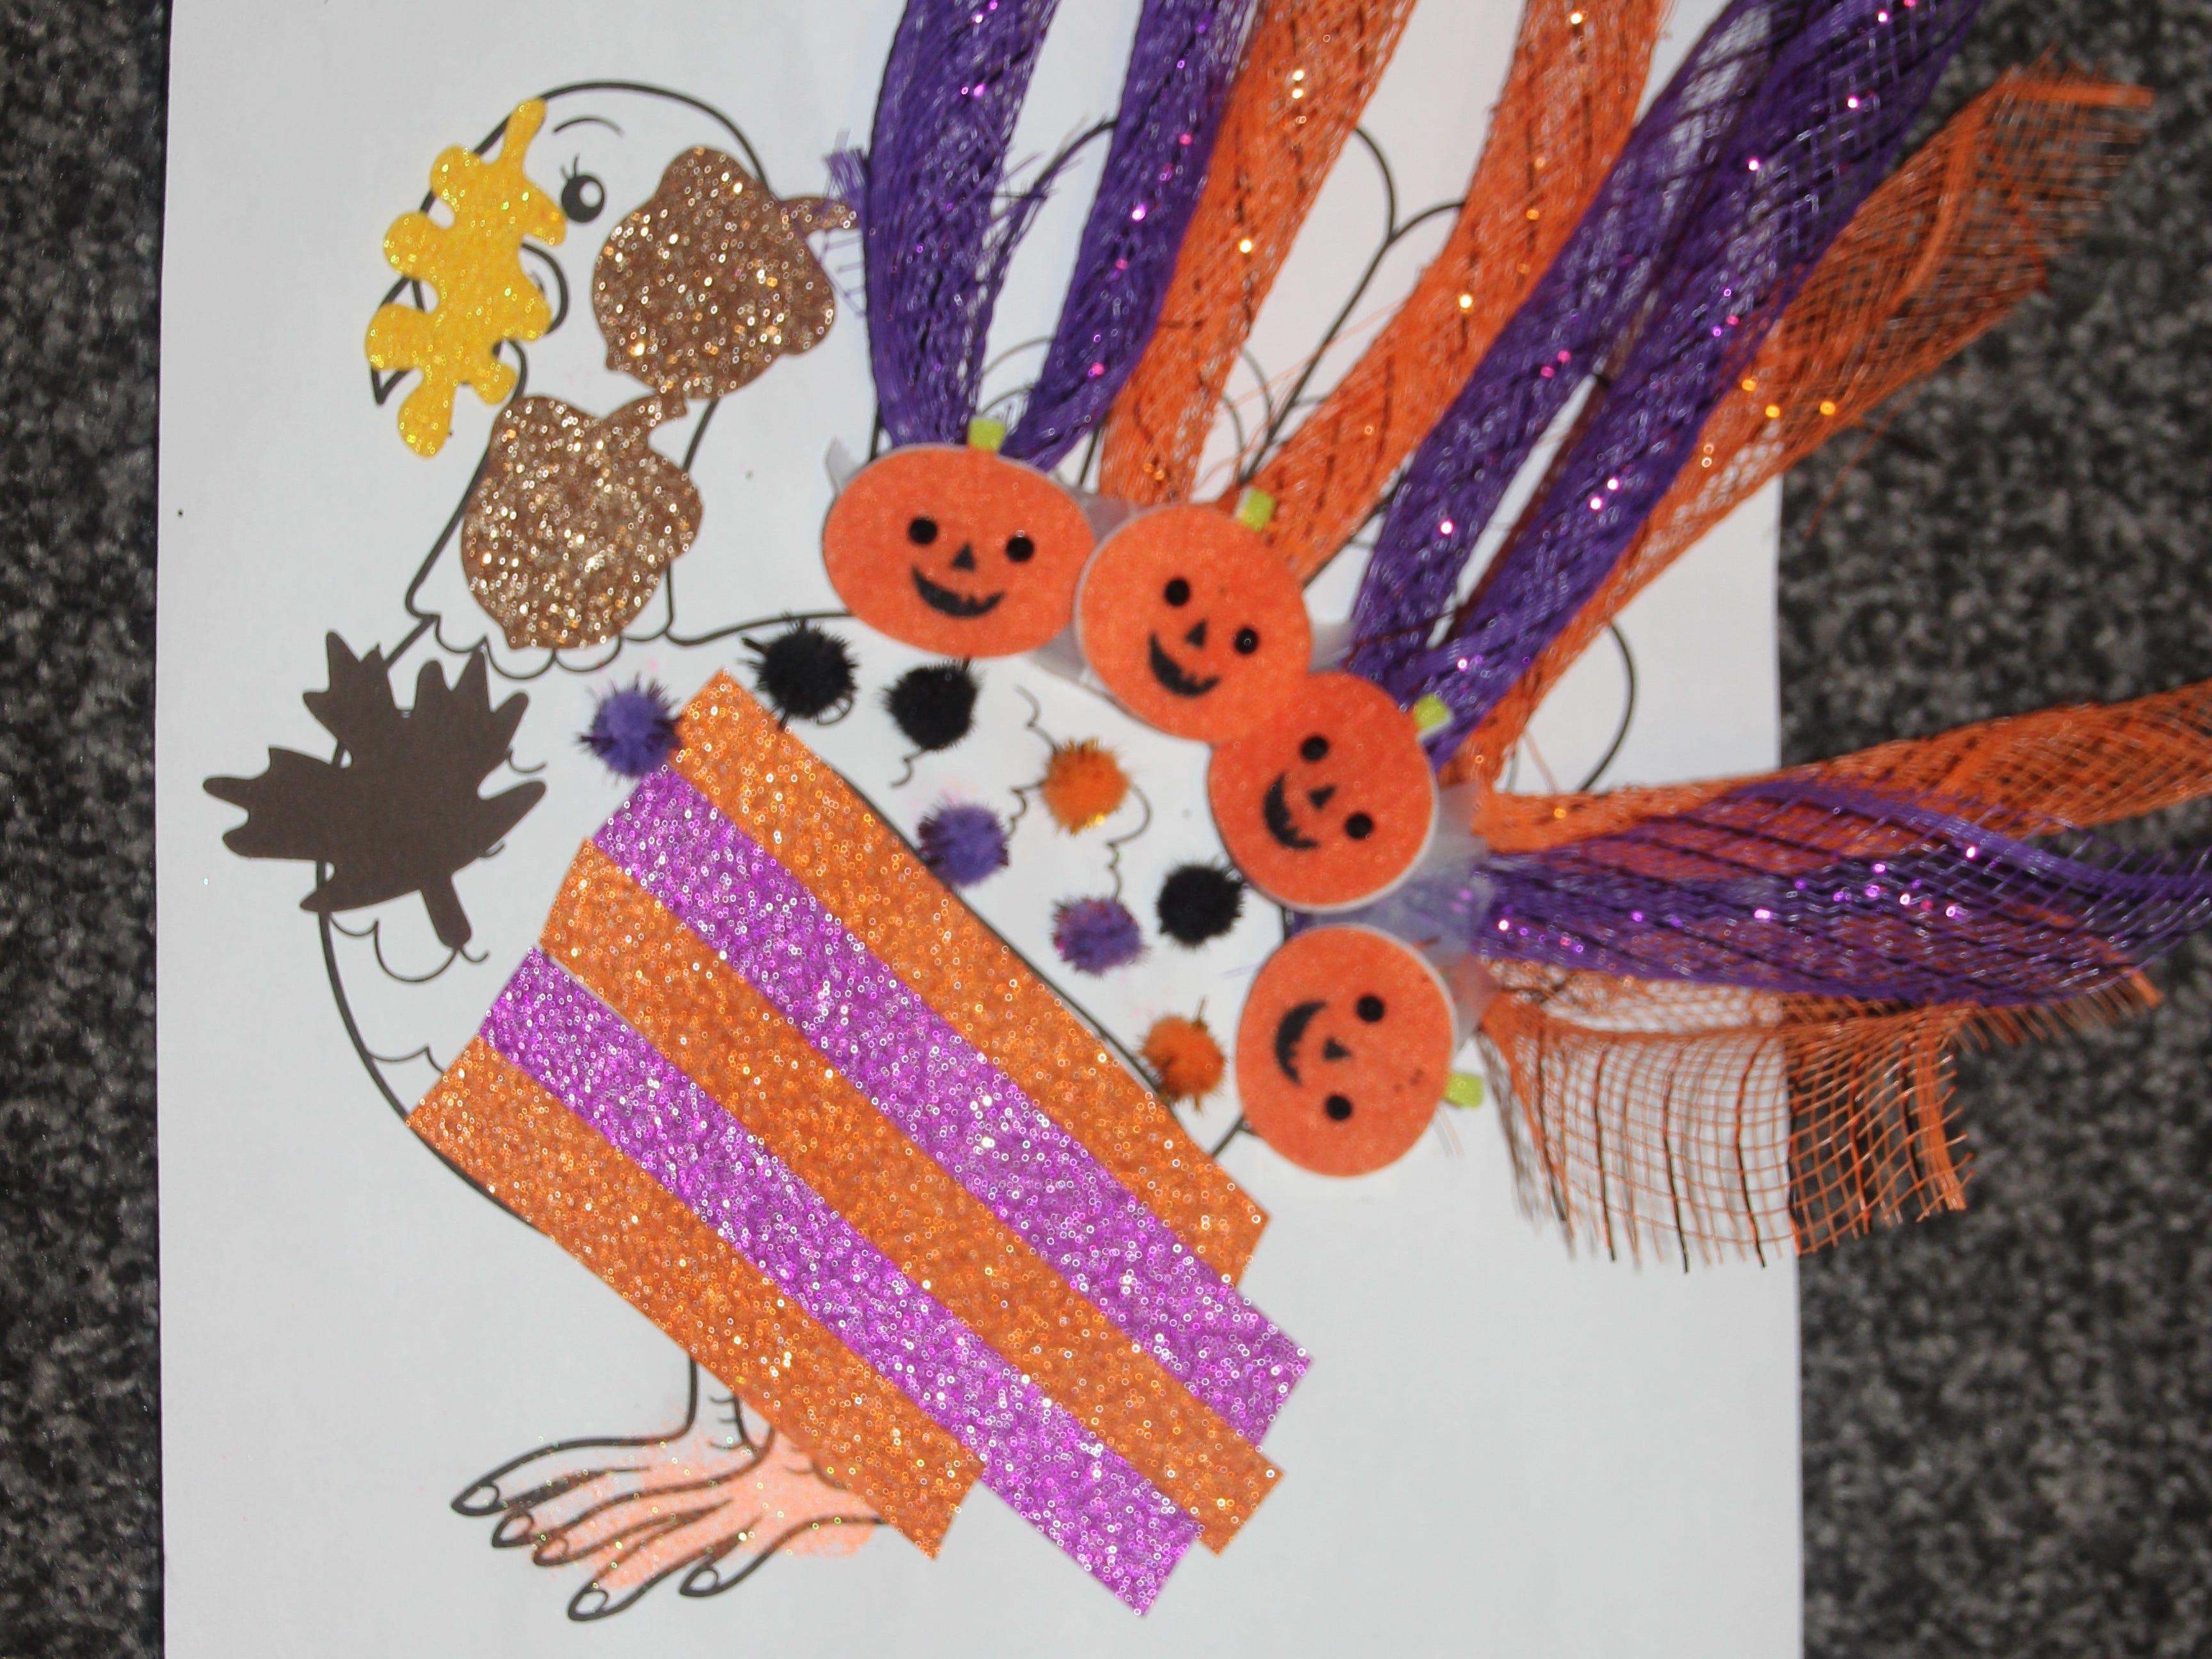 G. Pressler. Dress the Turkey Contest 2018.